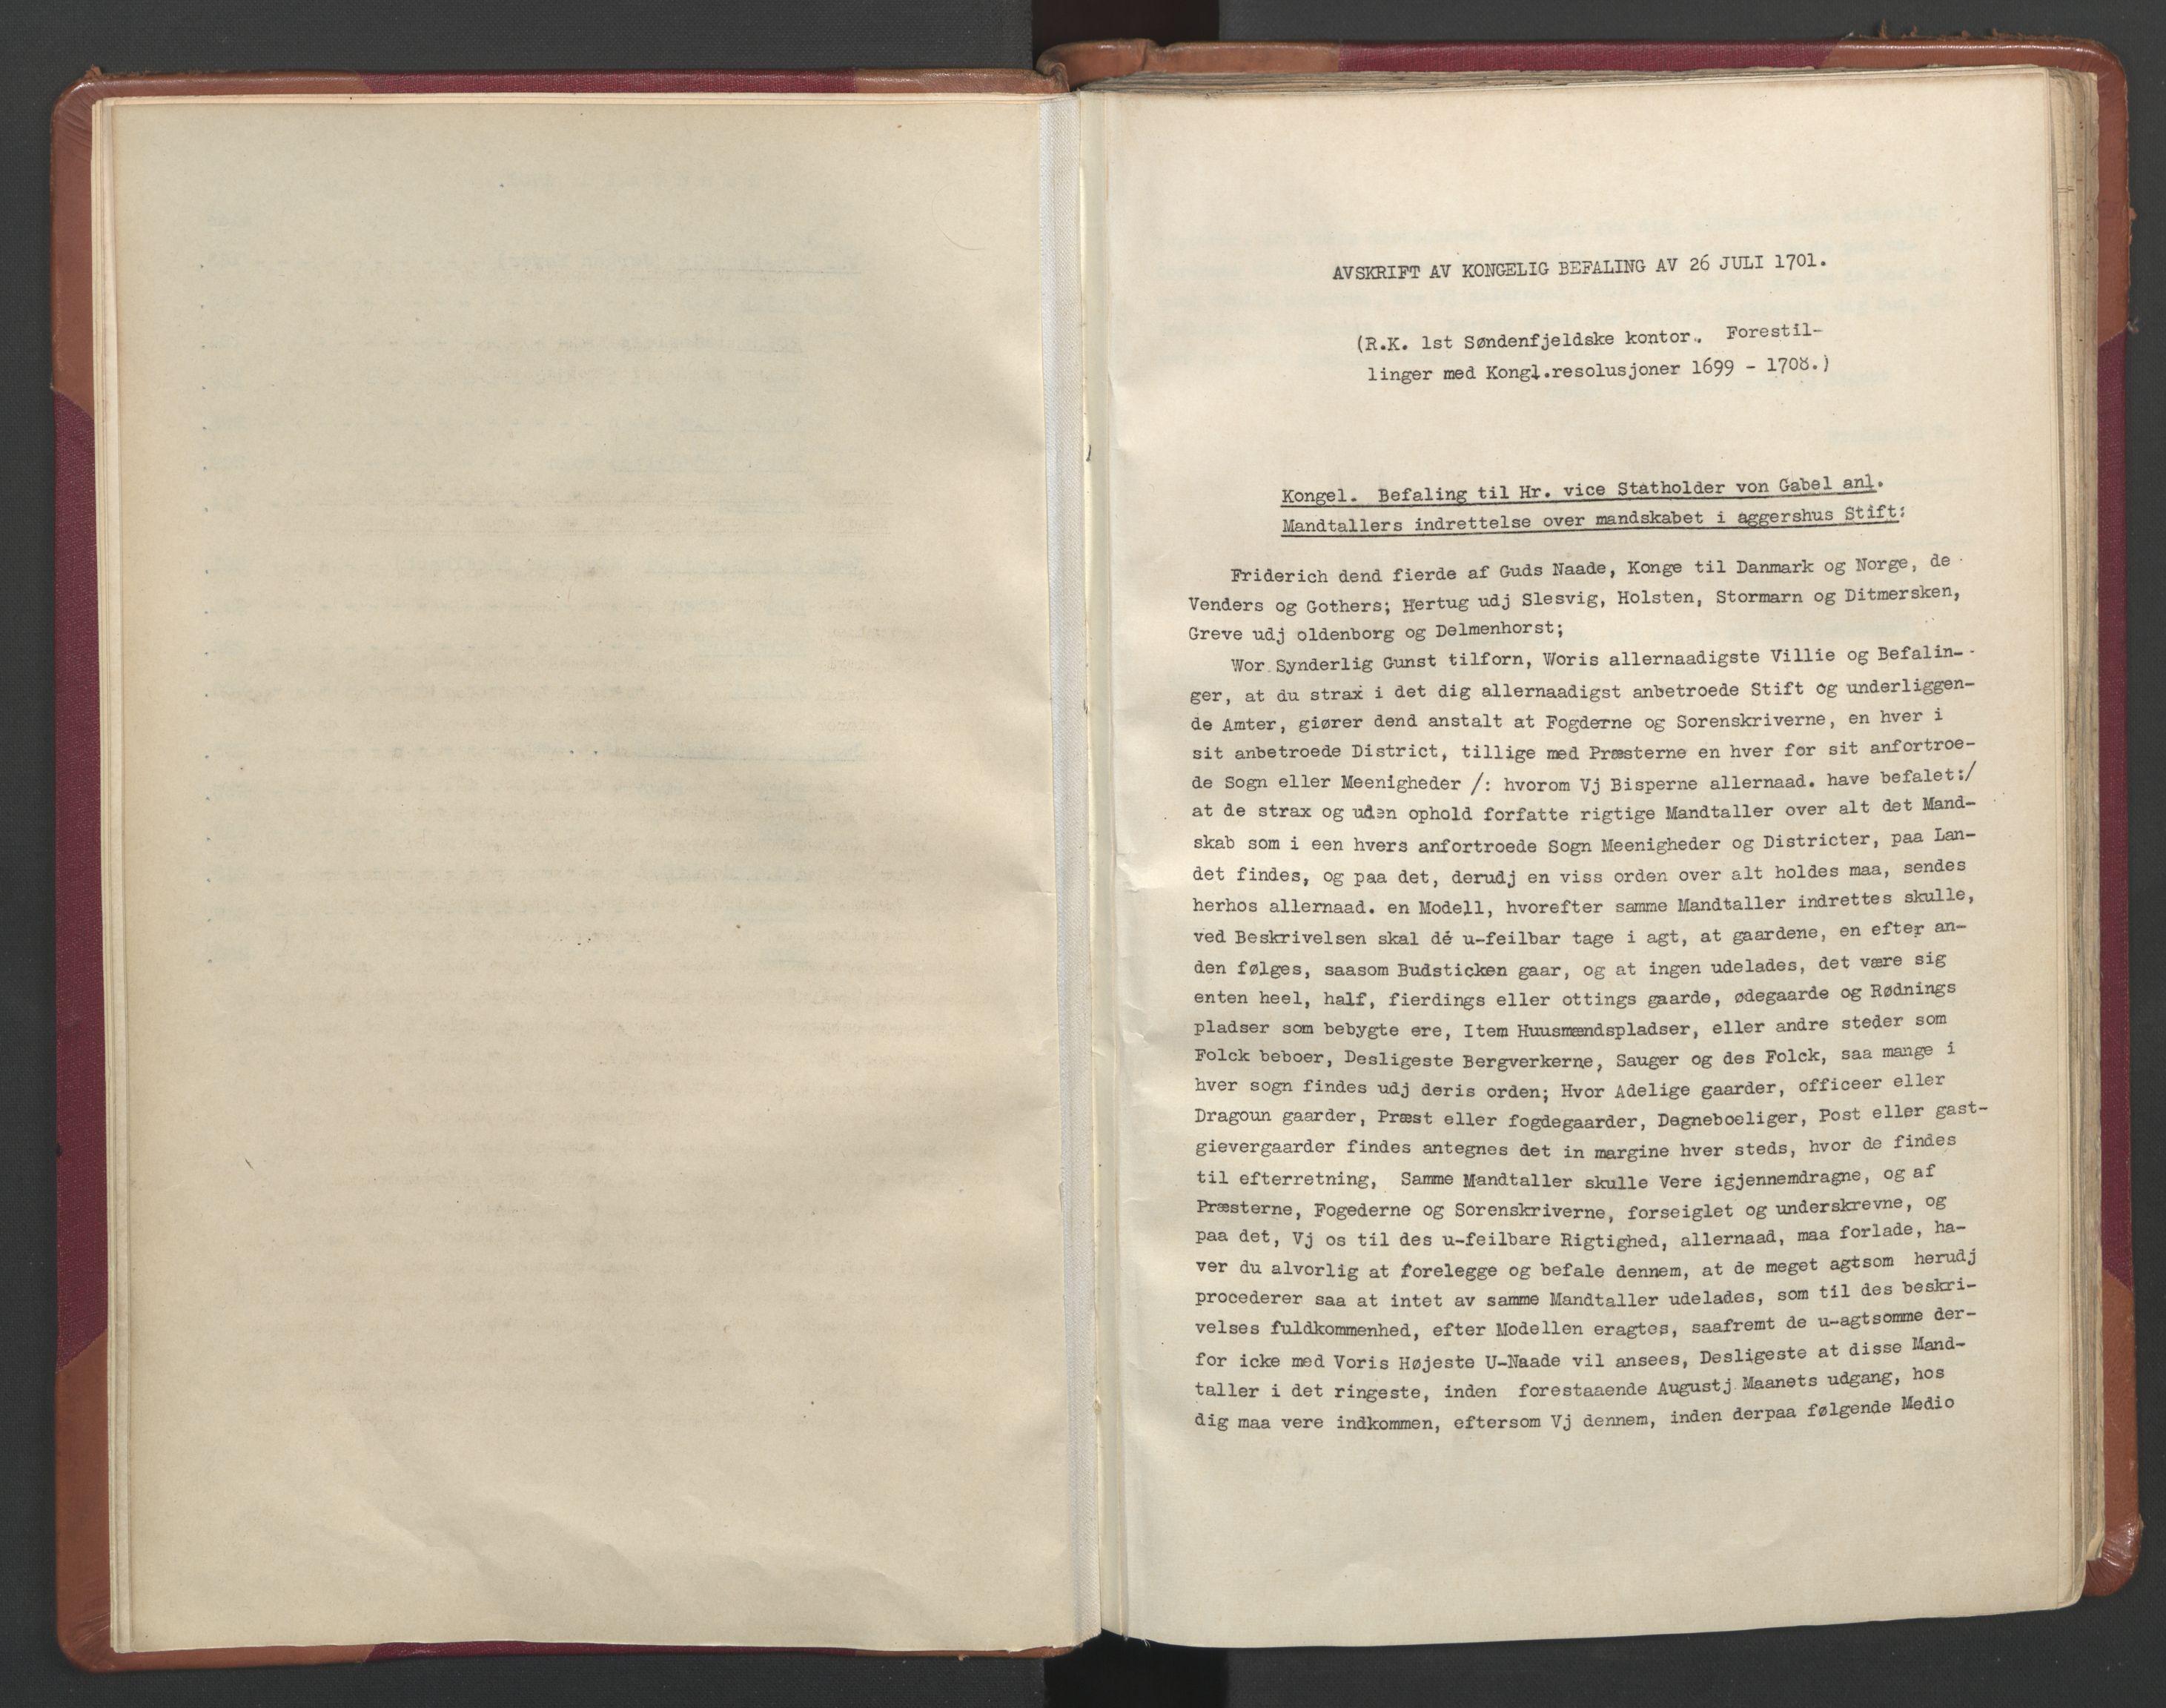 RA, Manntallet 1701, nr. 11: Nordmøre fogderi og Romsdal fogderi, 1701, s. upaginert